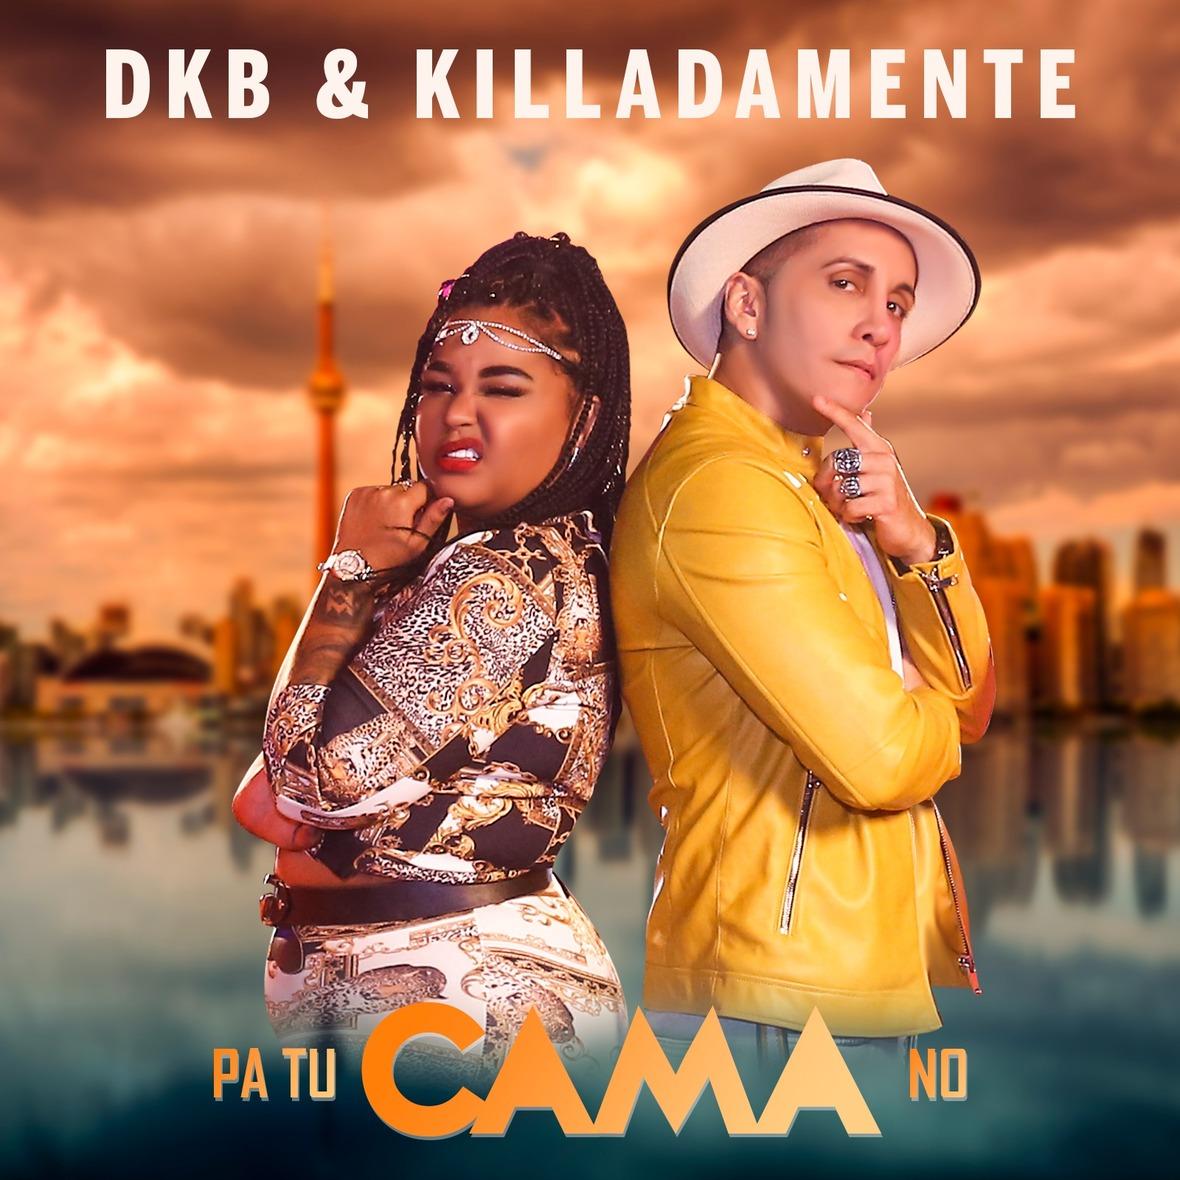 DKB Killadament Cover Single